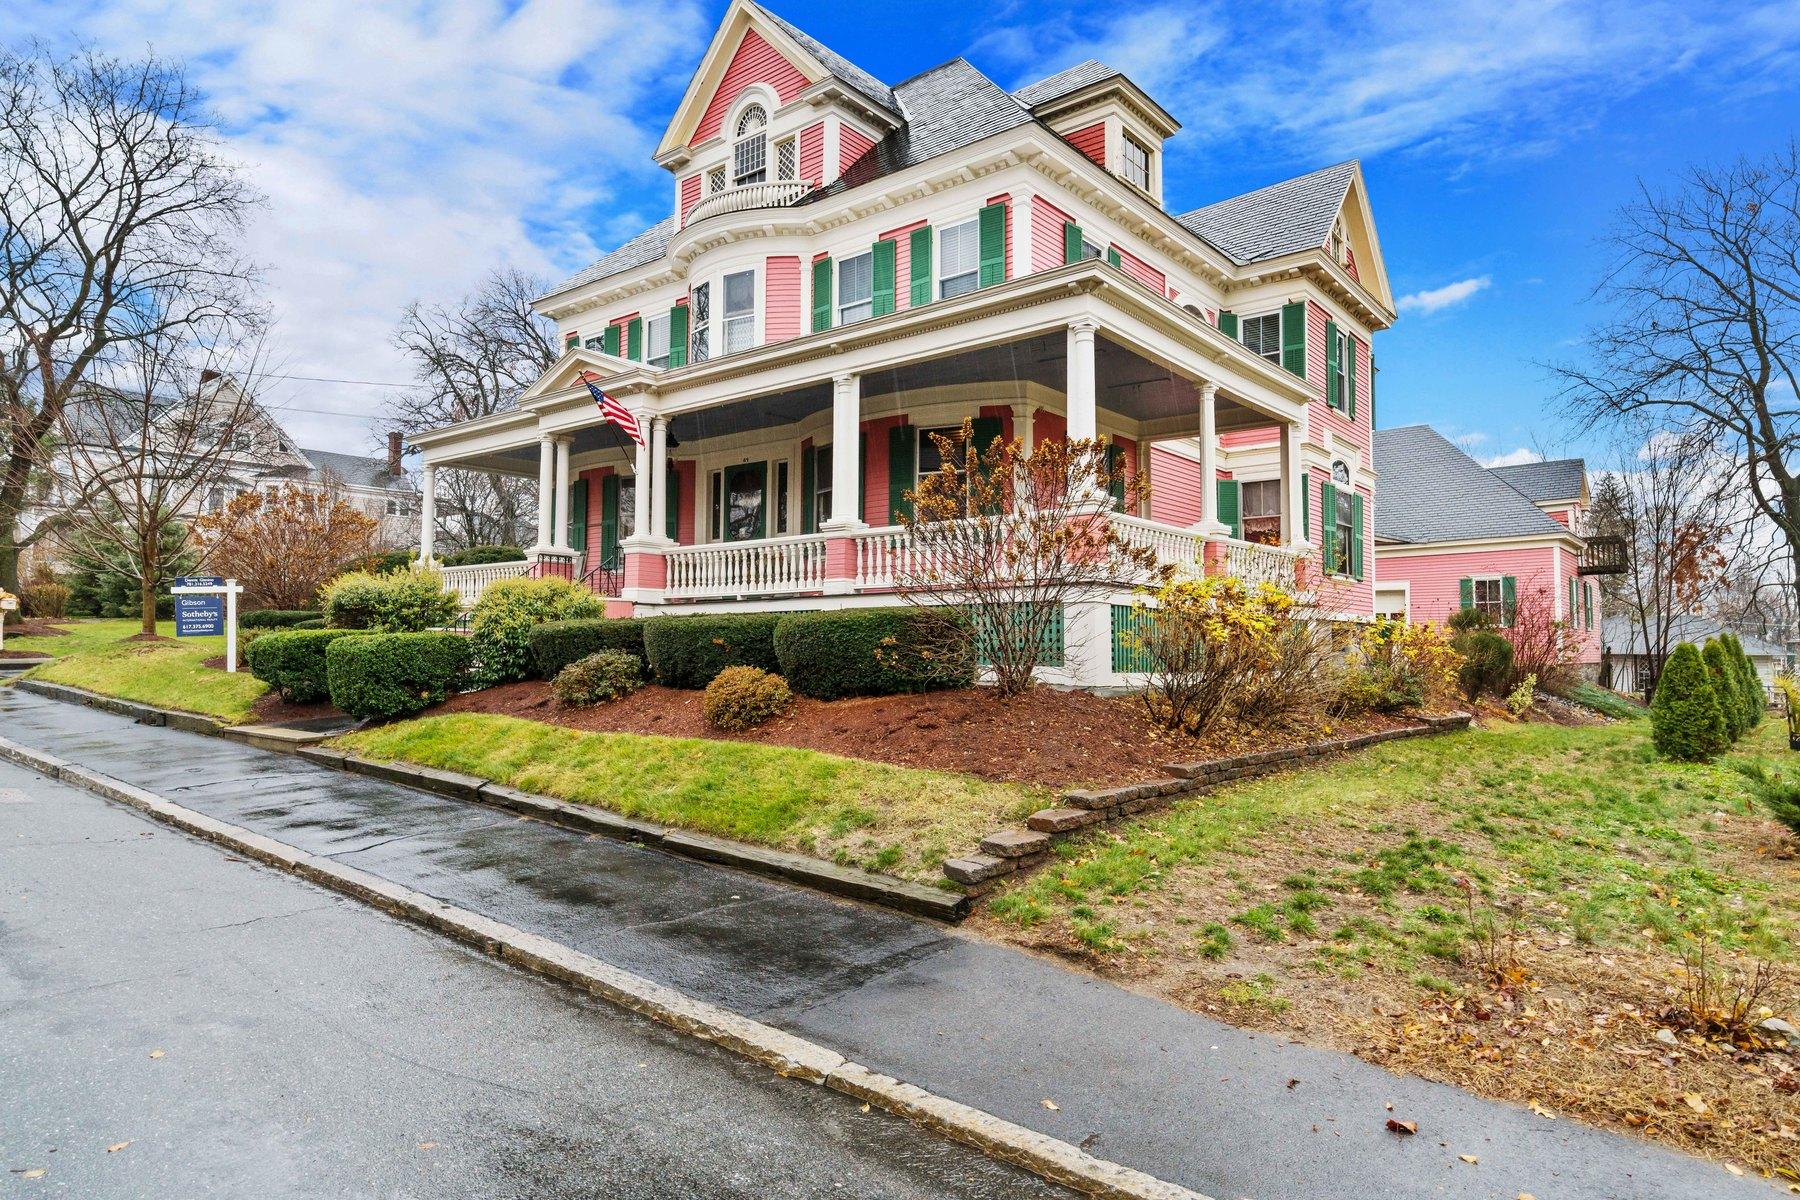 獨棟家庭住宅 為 出售 在 Beautiful Colonial Revival Home And Carriage House 89-95 Harvard Street Lowell, 麻塞諸塞州, 01851 美國